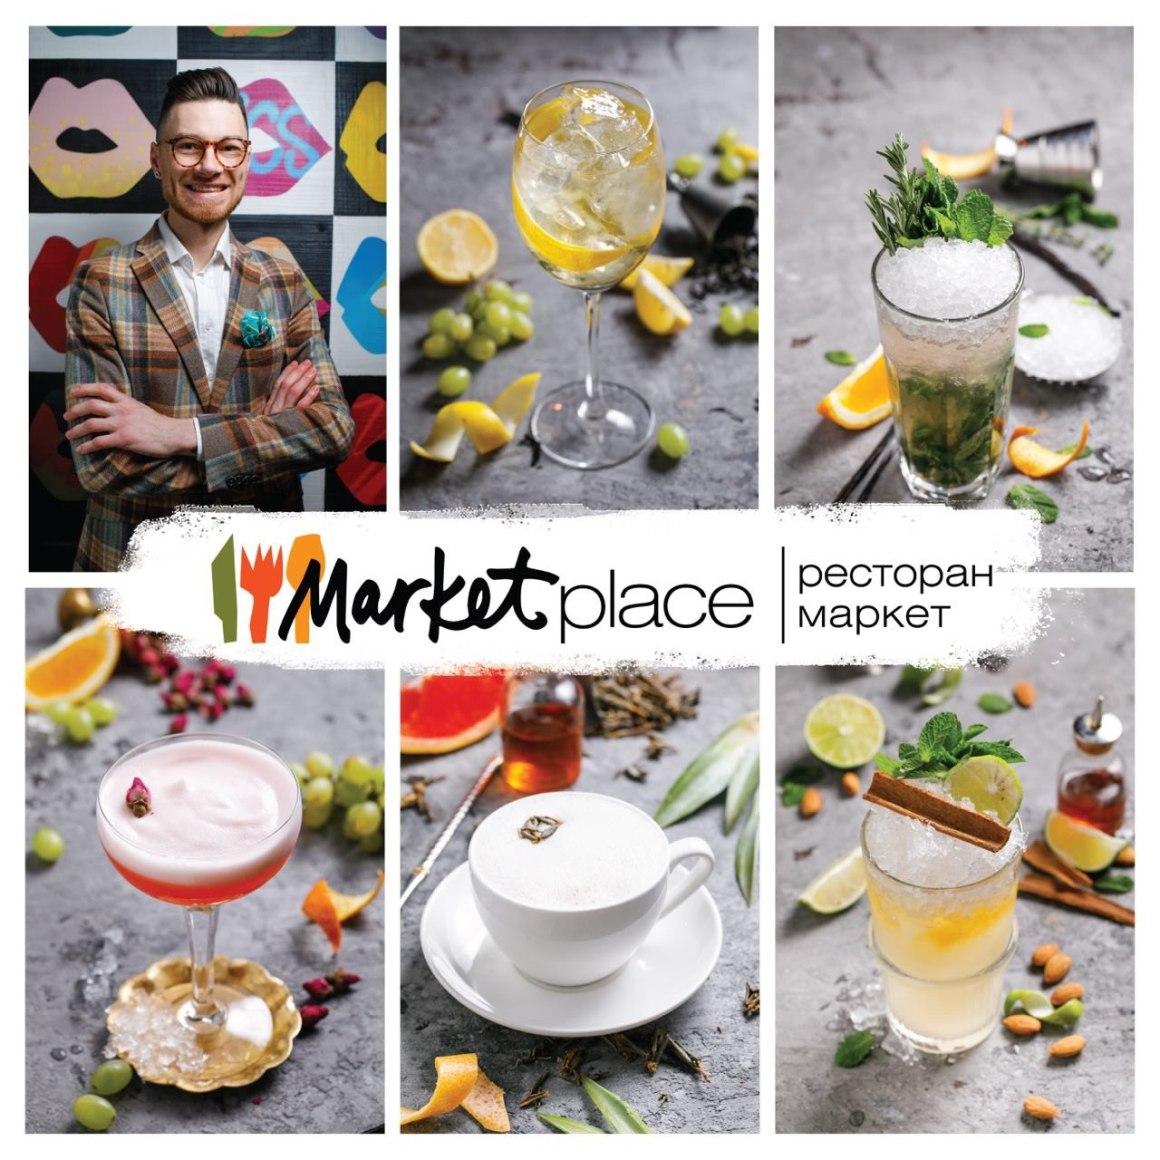 Marketplace меню